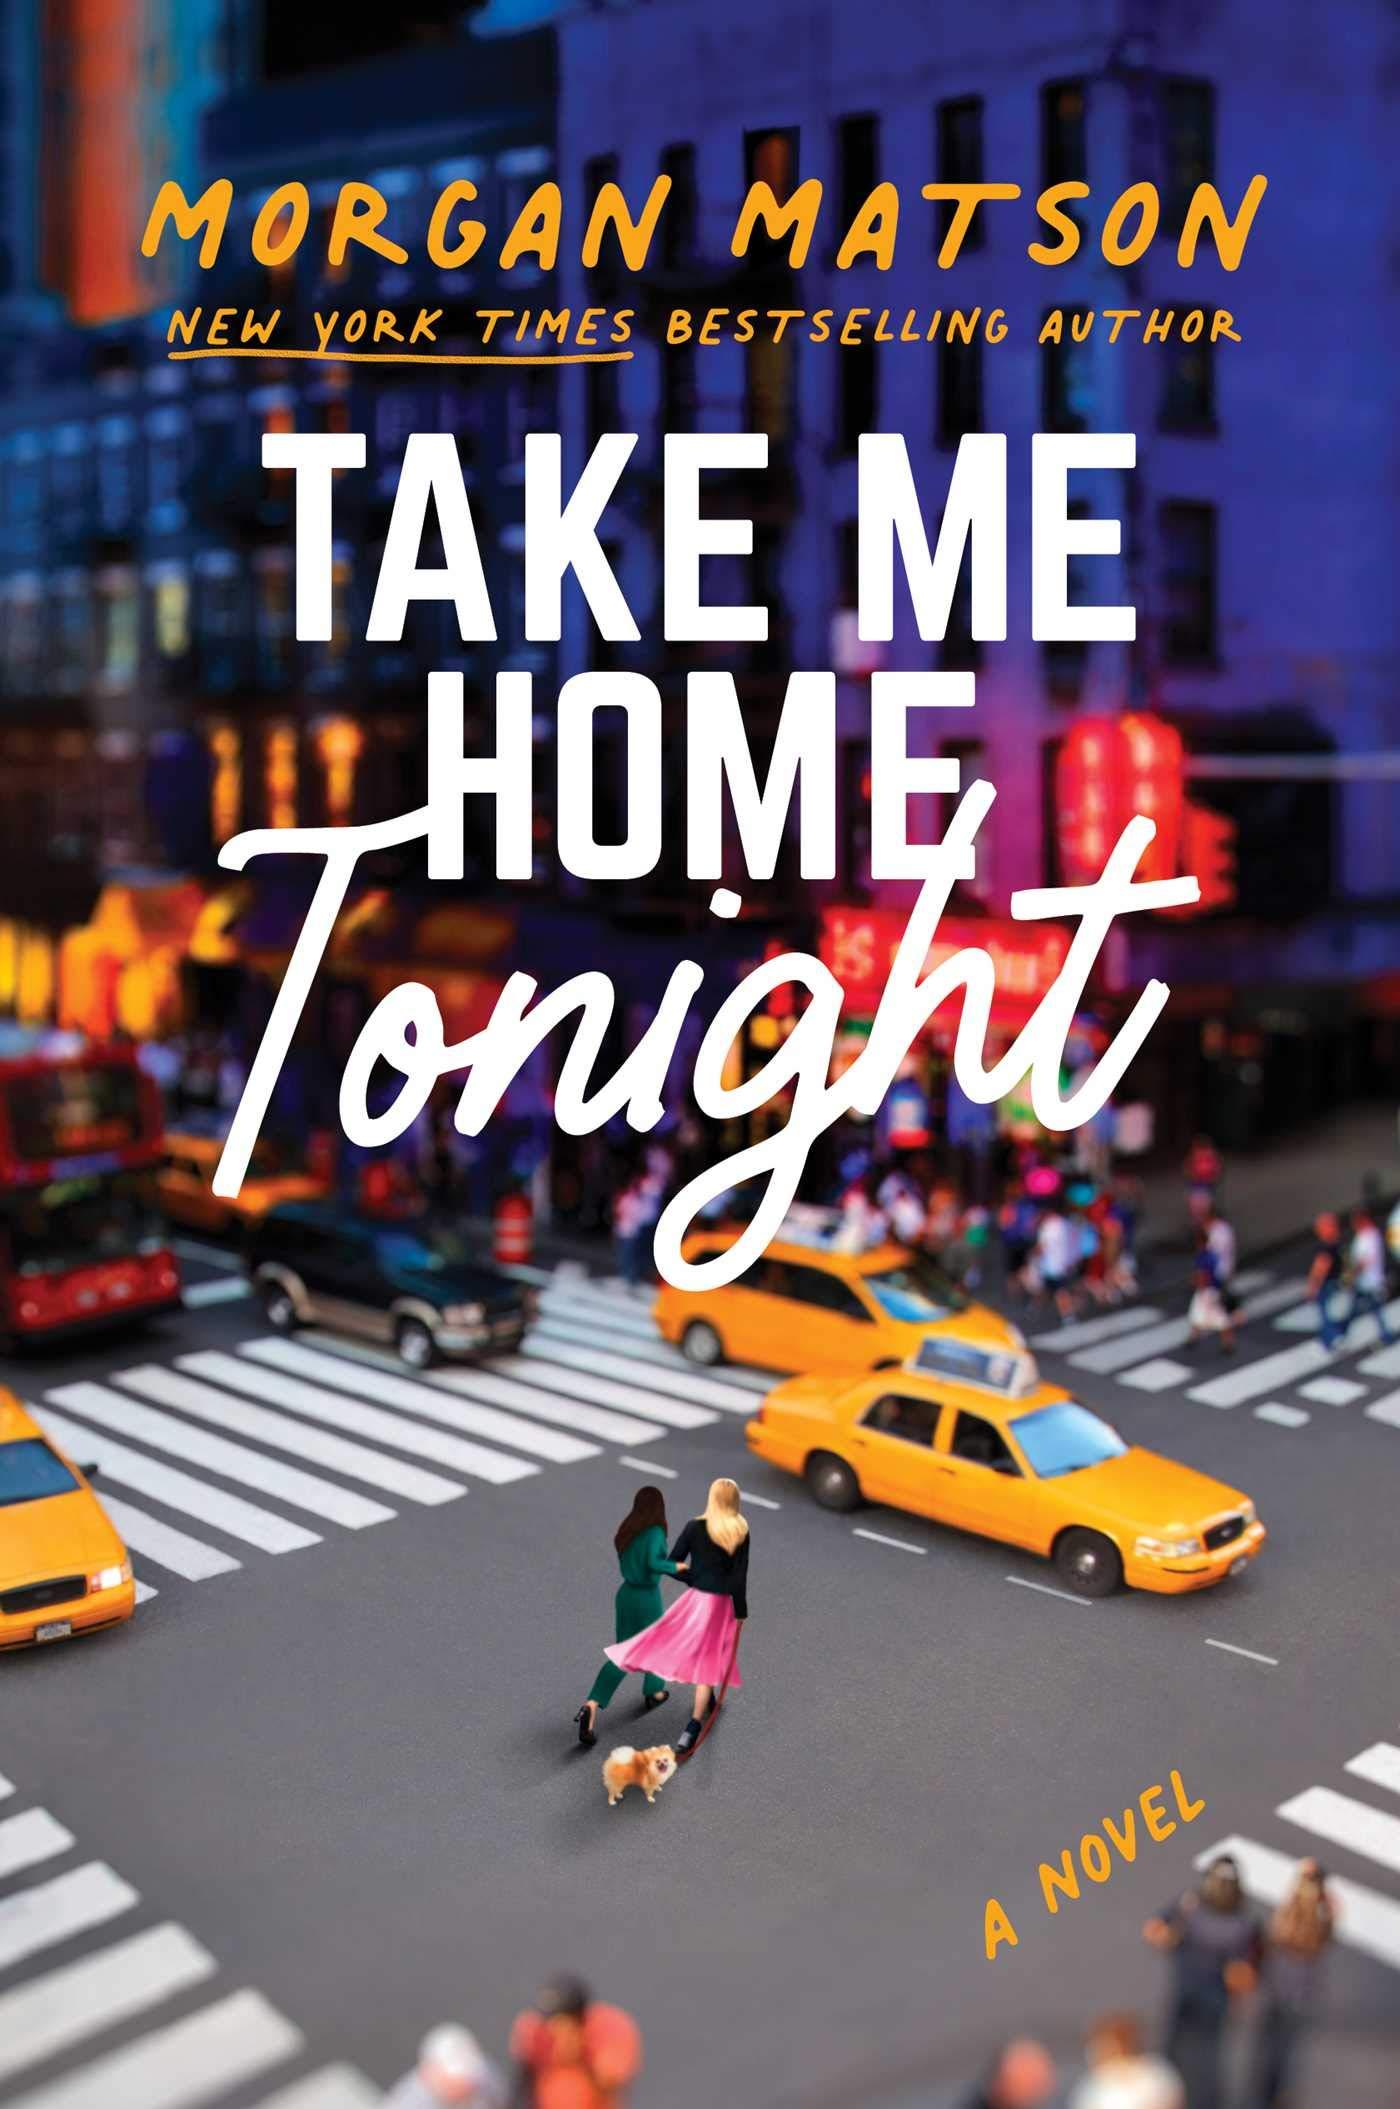 Amazon.com: Take Me Home Tonight (9781481498982): Matson, Morgan: Books